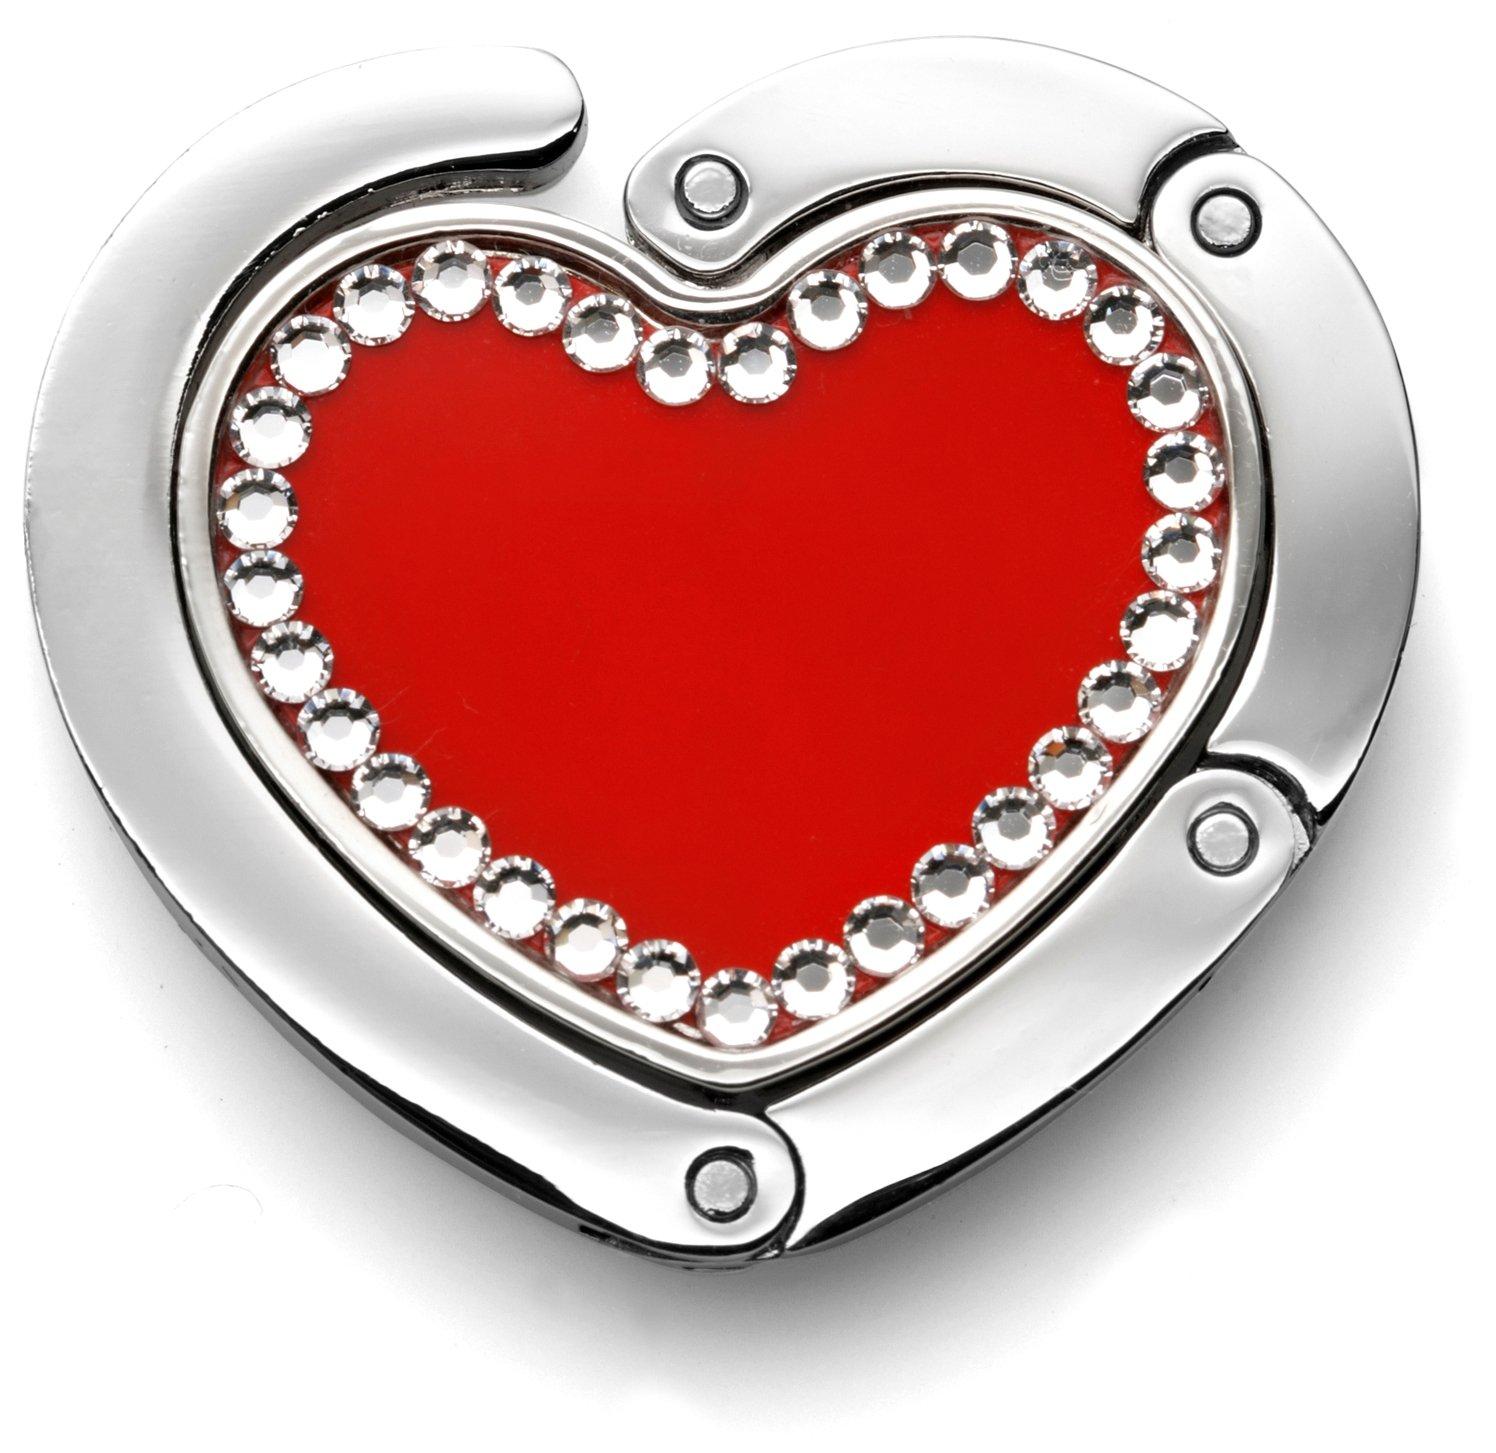 Handbag-hanger Purse Hanger Heart Shaped in Black or Red - Crystallized with Swarovski-elements - By Fine European Stuff (Red)